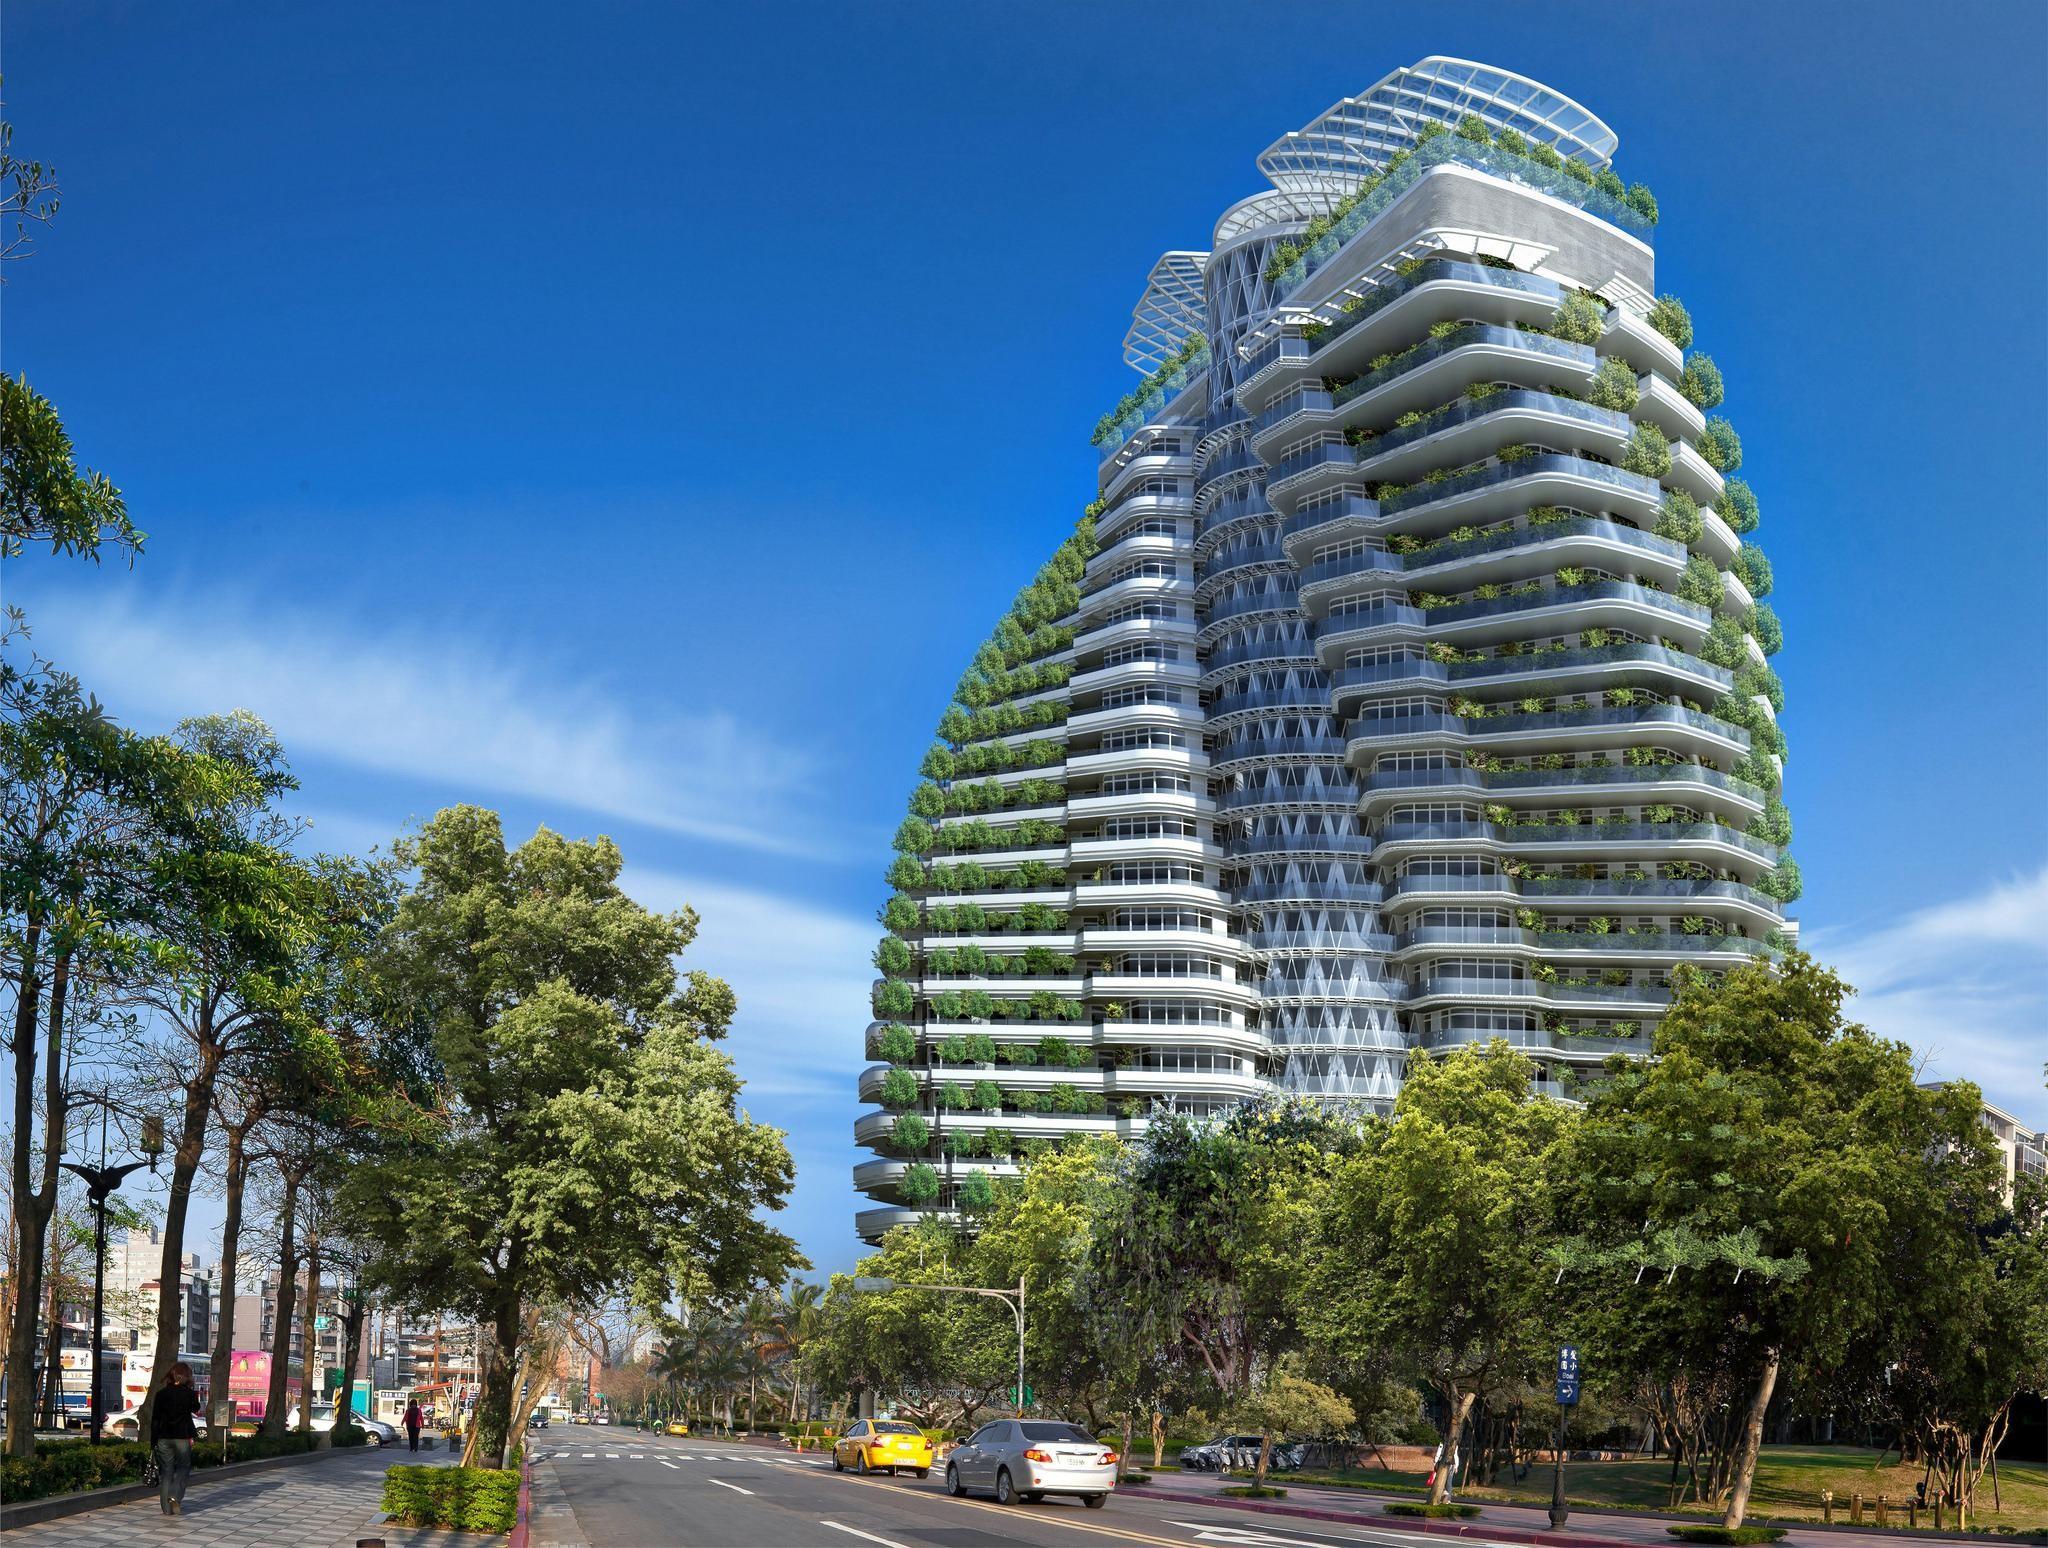 La torre está situada en la capital de Taiwán